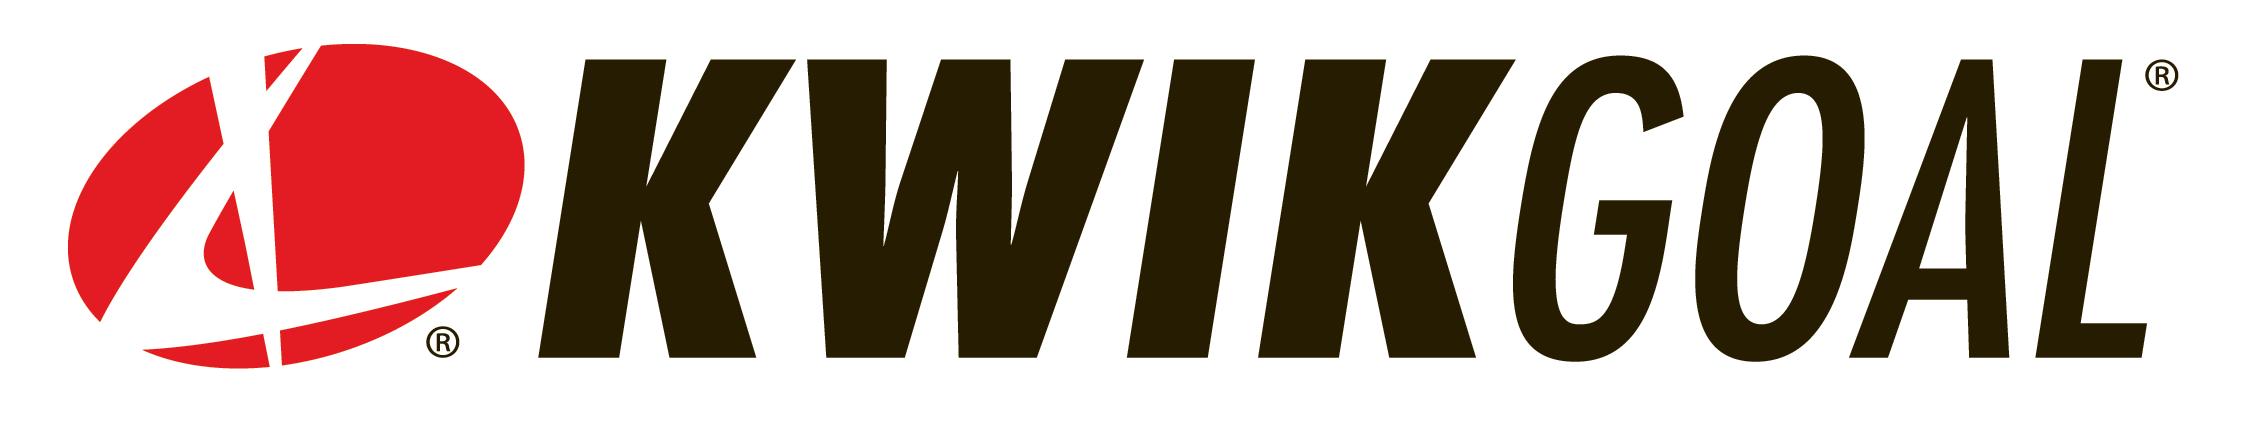 Powered by DCatalog Inc. - Kwik Goal Logo PNG